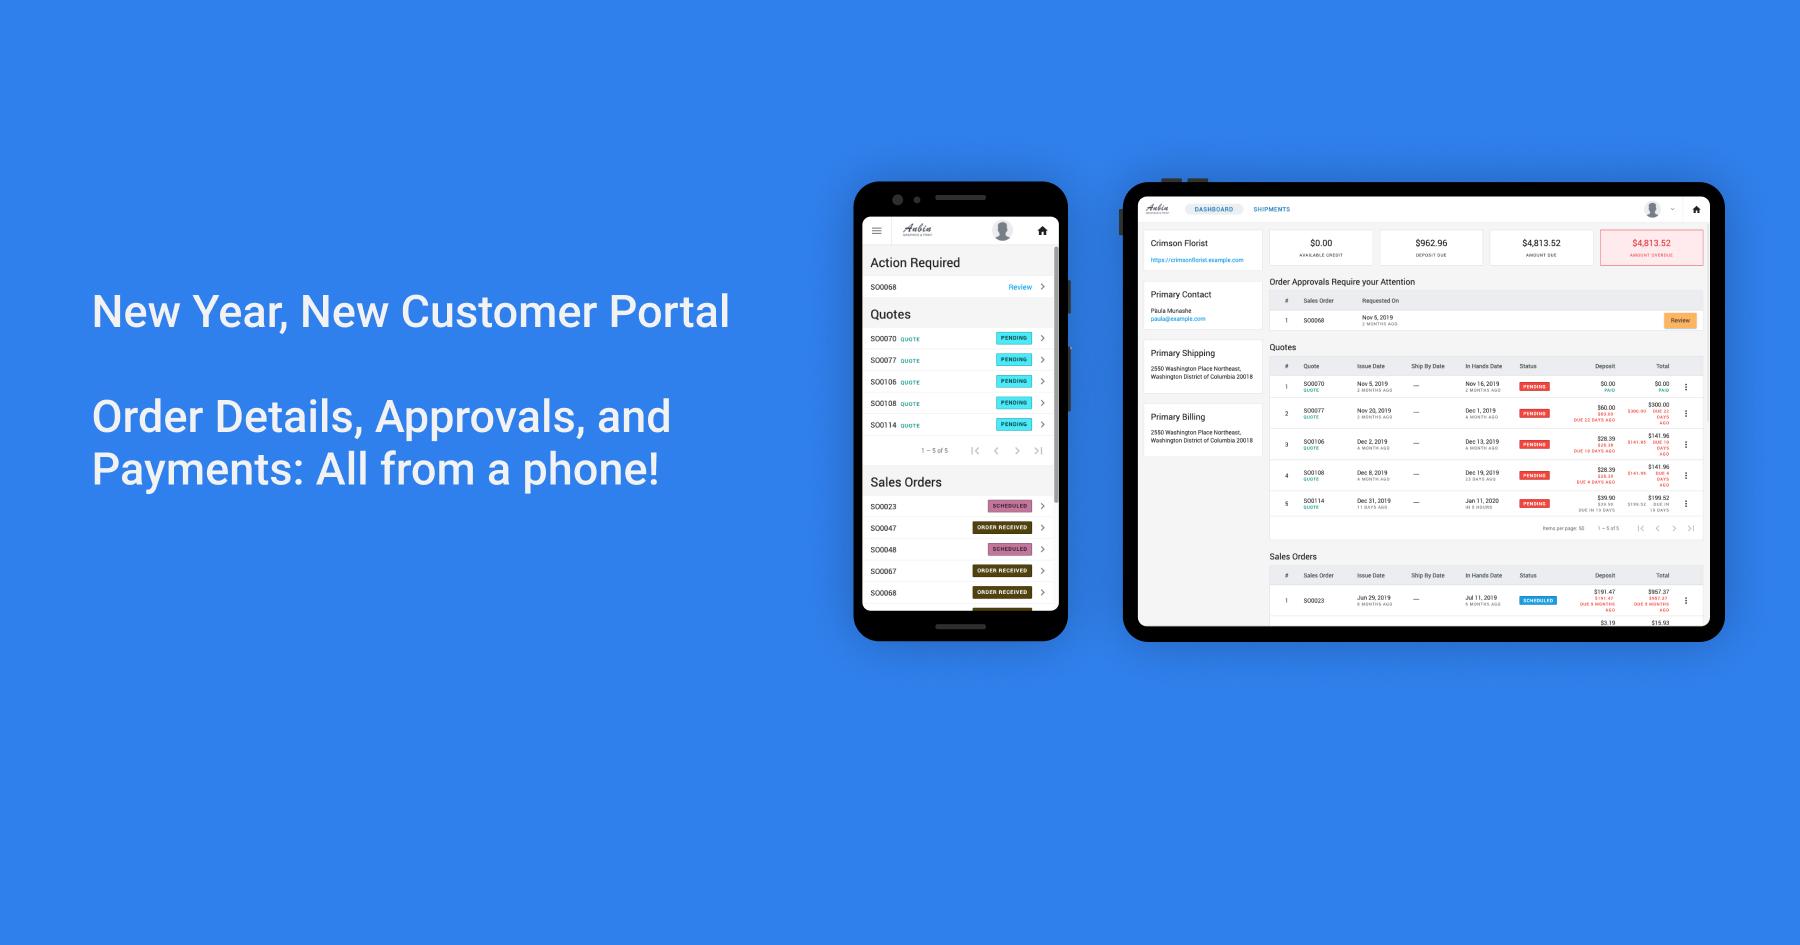 New Year New Customer Portal 2.1